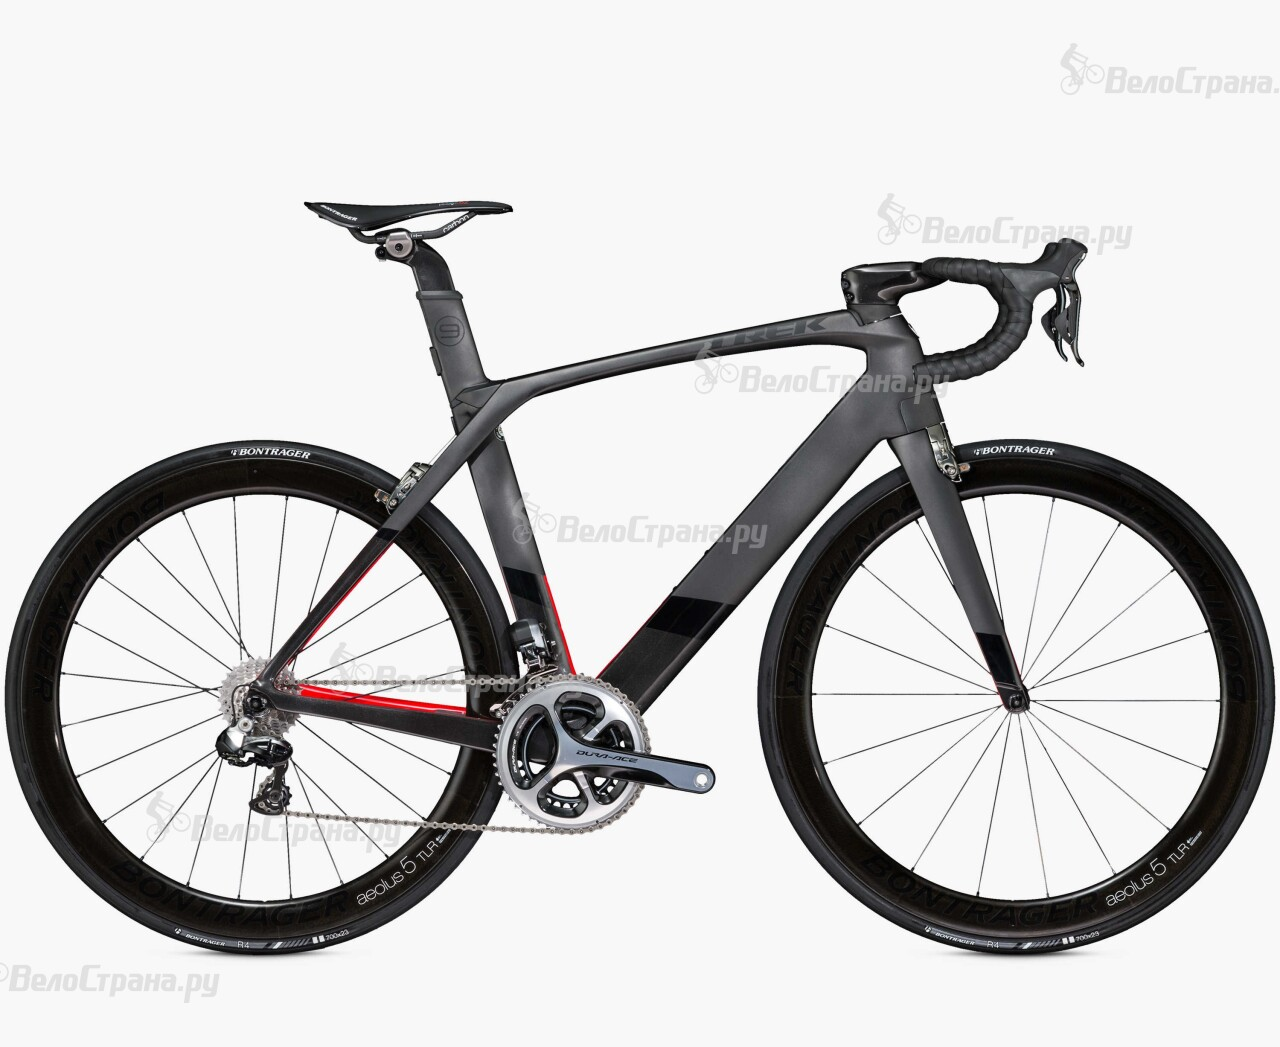 Велосипед Trek Madone 9.9 (2016) велосипед trek madone 5 9 2013